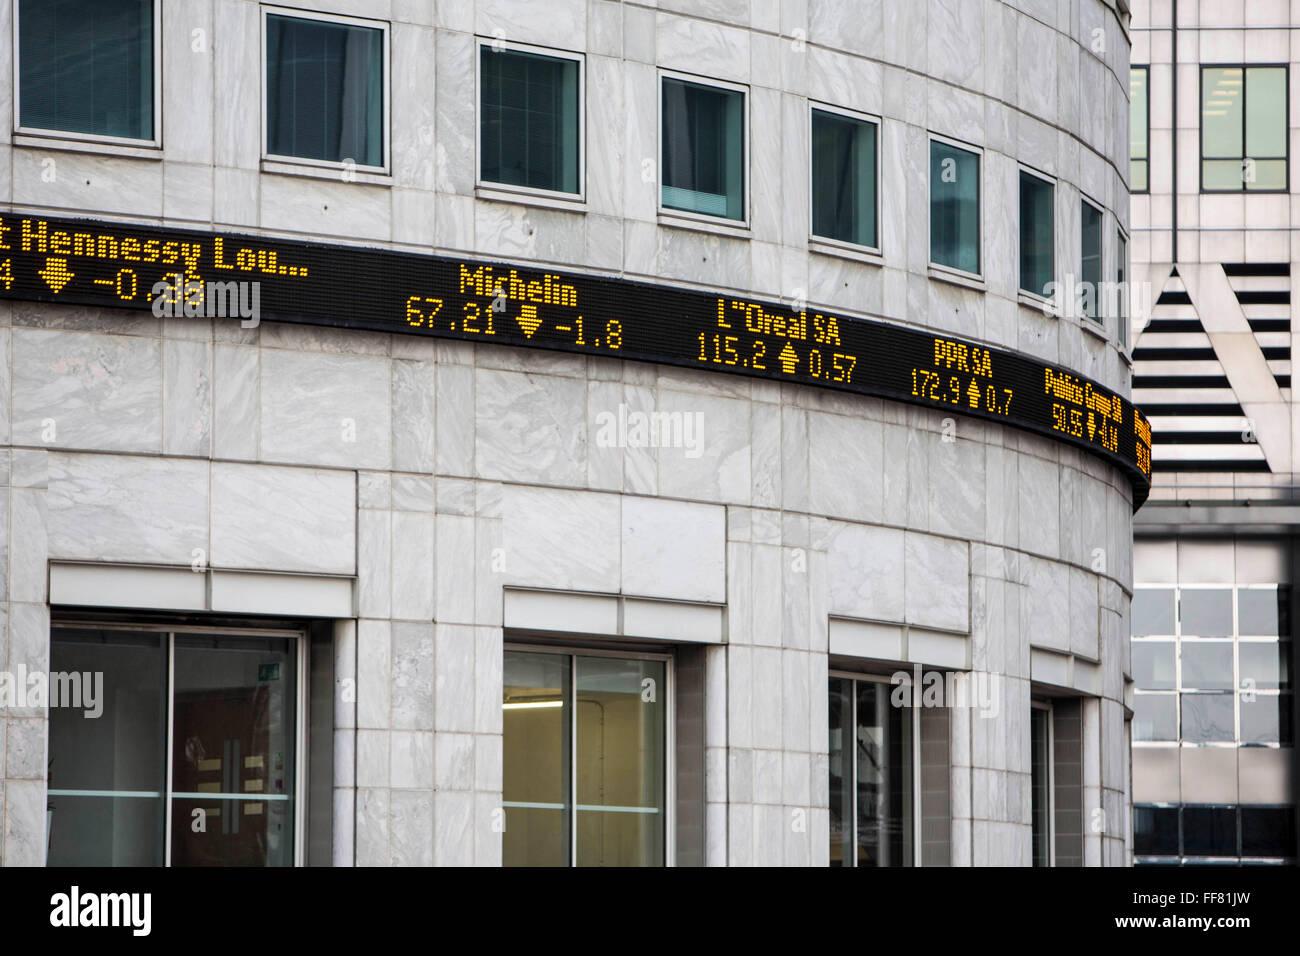 Ftse 100 Index Stock Photos Ftse 100 Index Stock Images Alamy